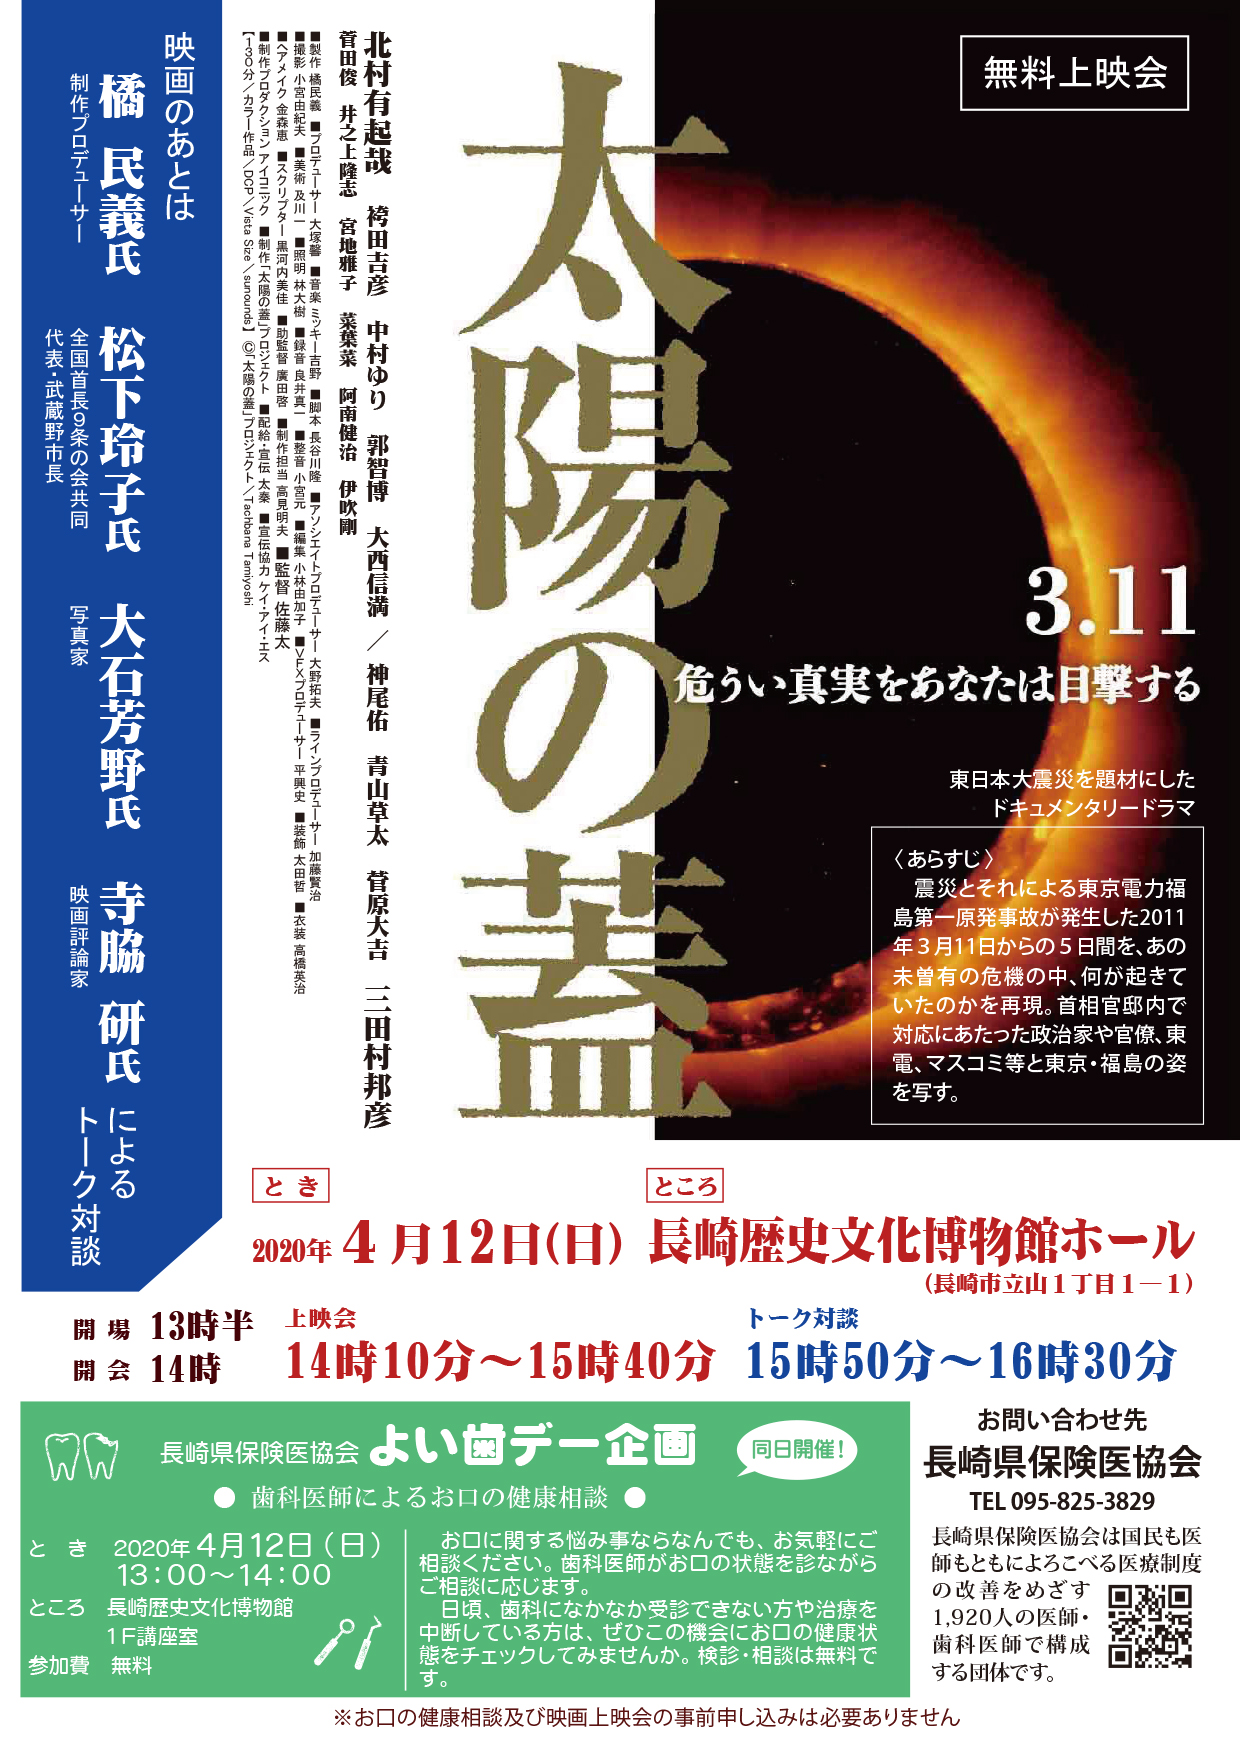 映画「太陽の蓋」上映会